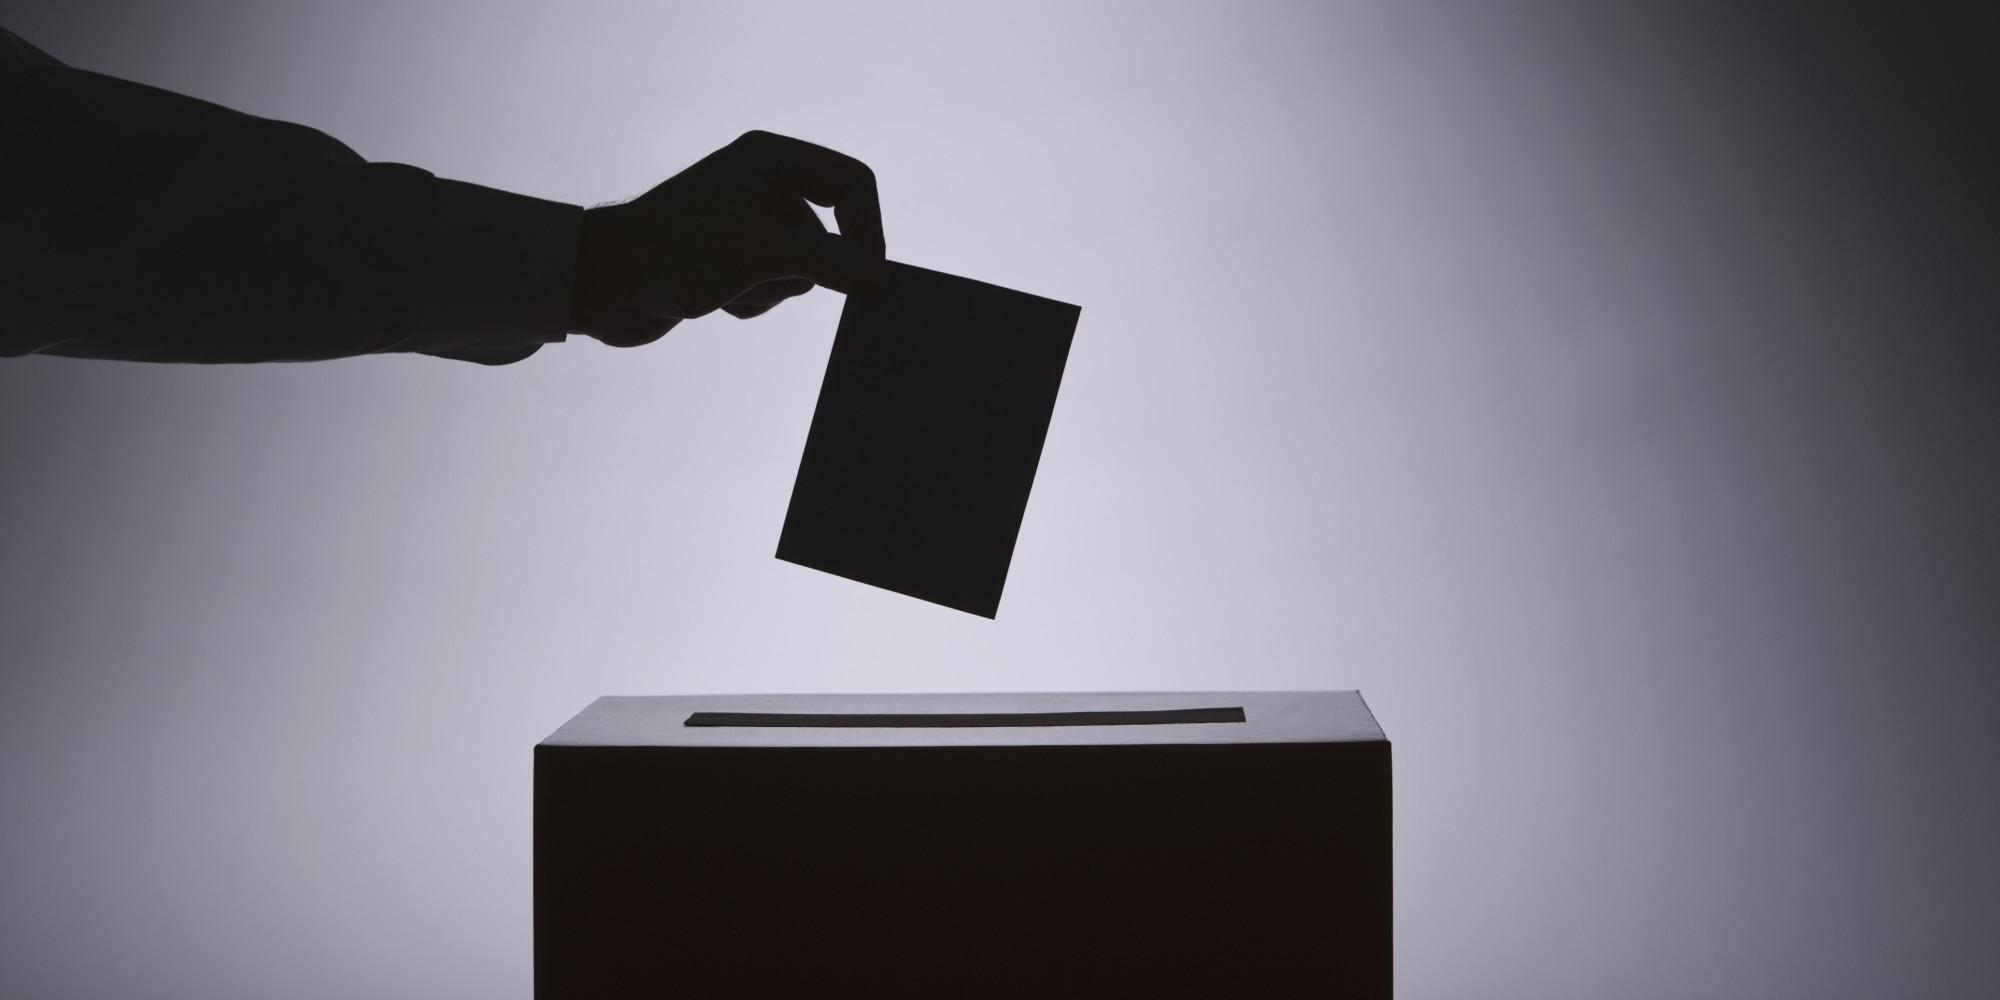 Vote PR BC urging residents to take advantage of Referendum extension